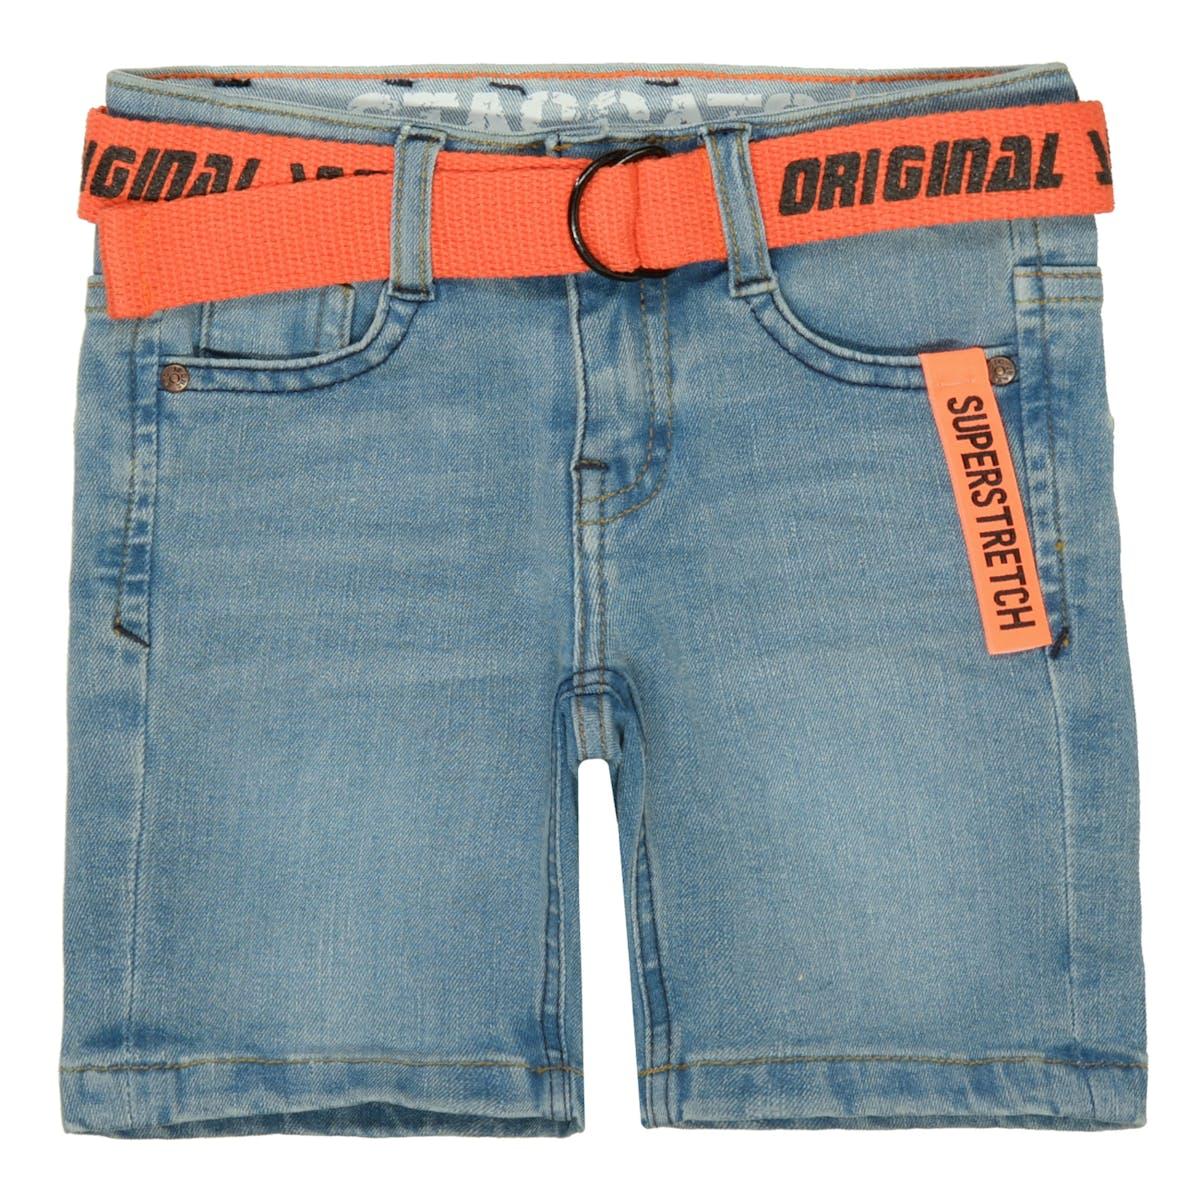 Jeans-Bermudas mit Gürtel - Light Blue Denim